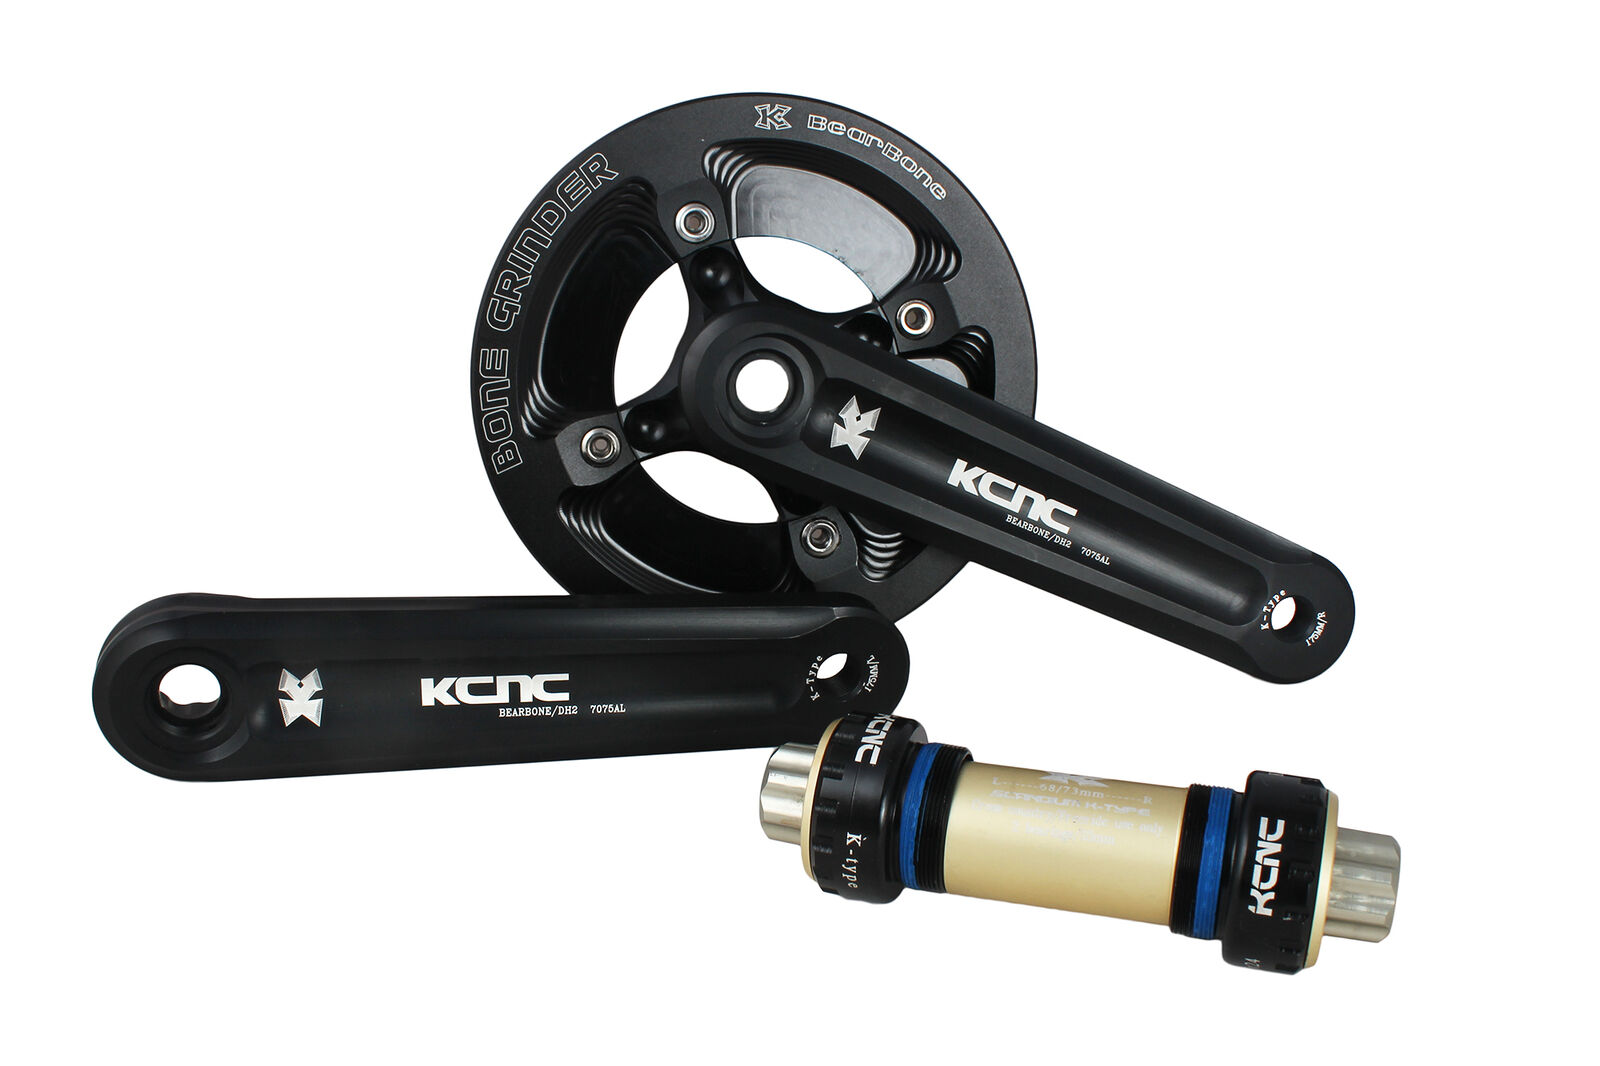 KCNC DH1 Mountain Cycling Bike Crankset for Down Hill w Bash Guard 39t 175mm